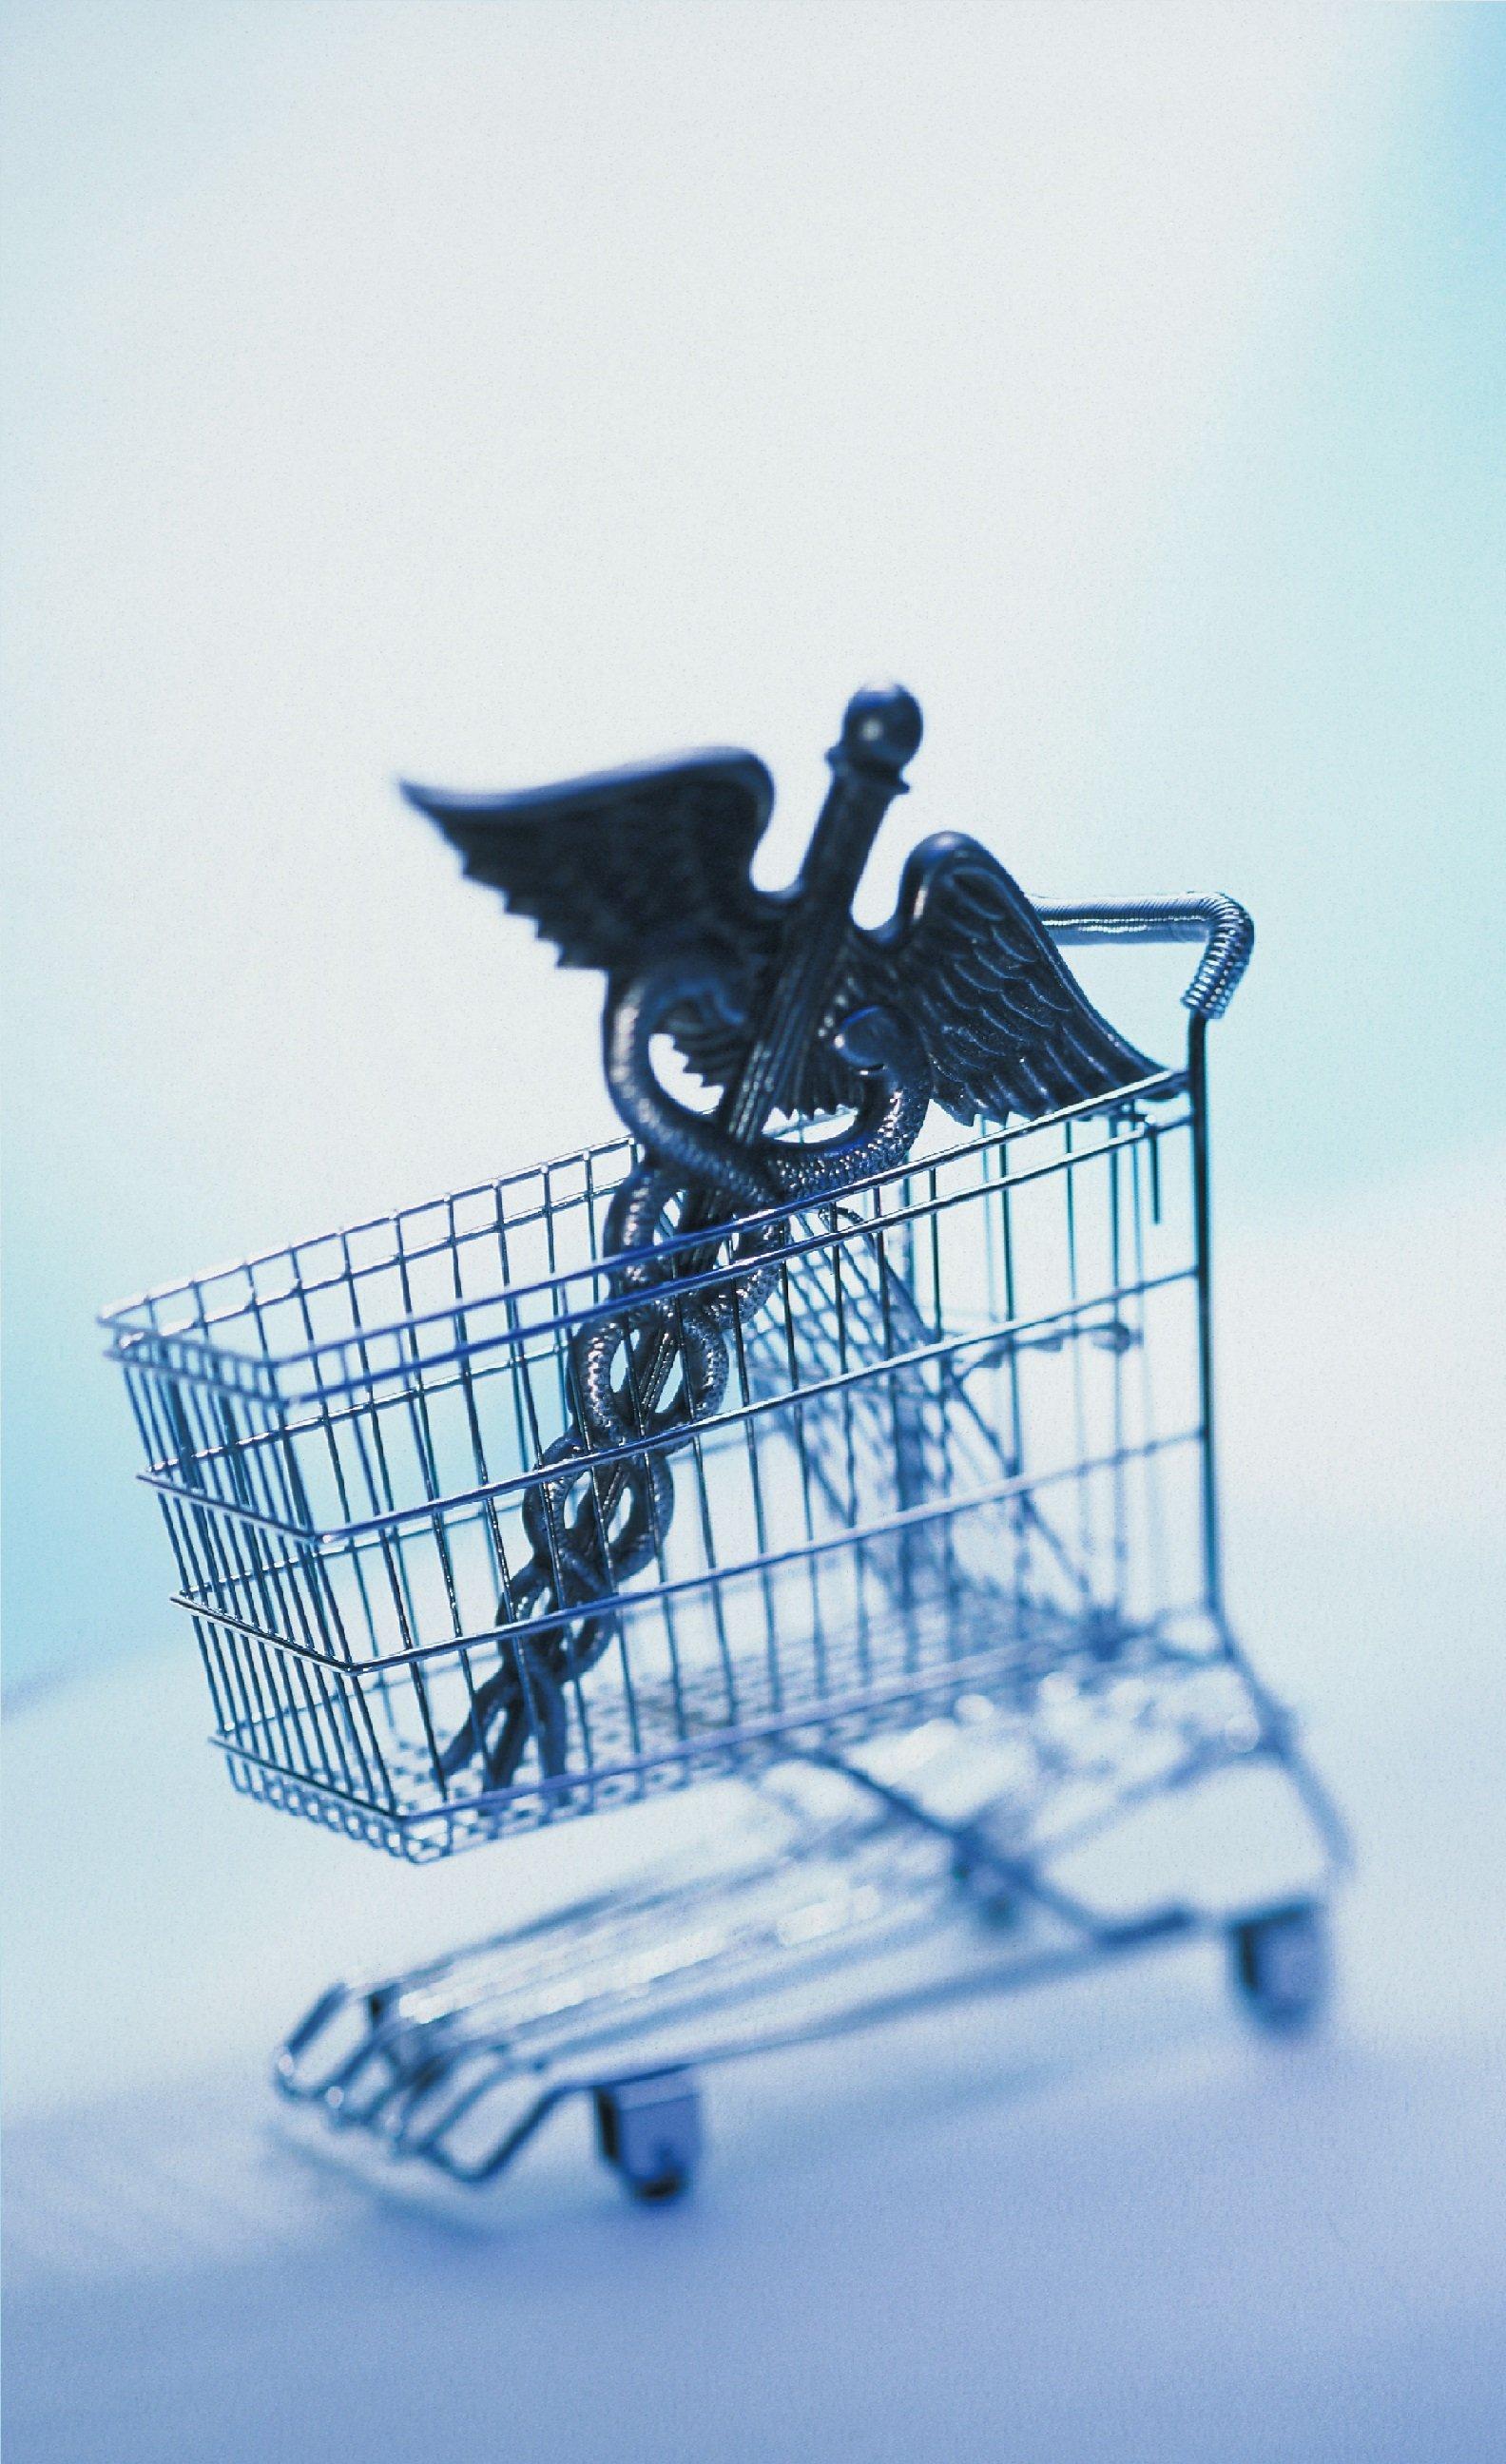 shoping for health insurance arizona